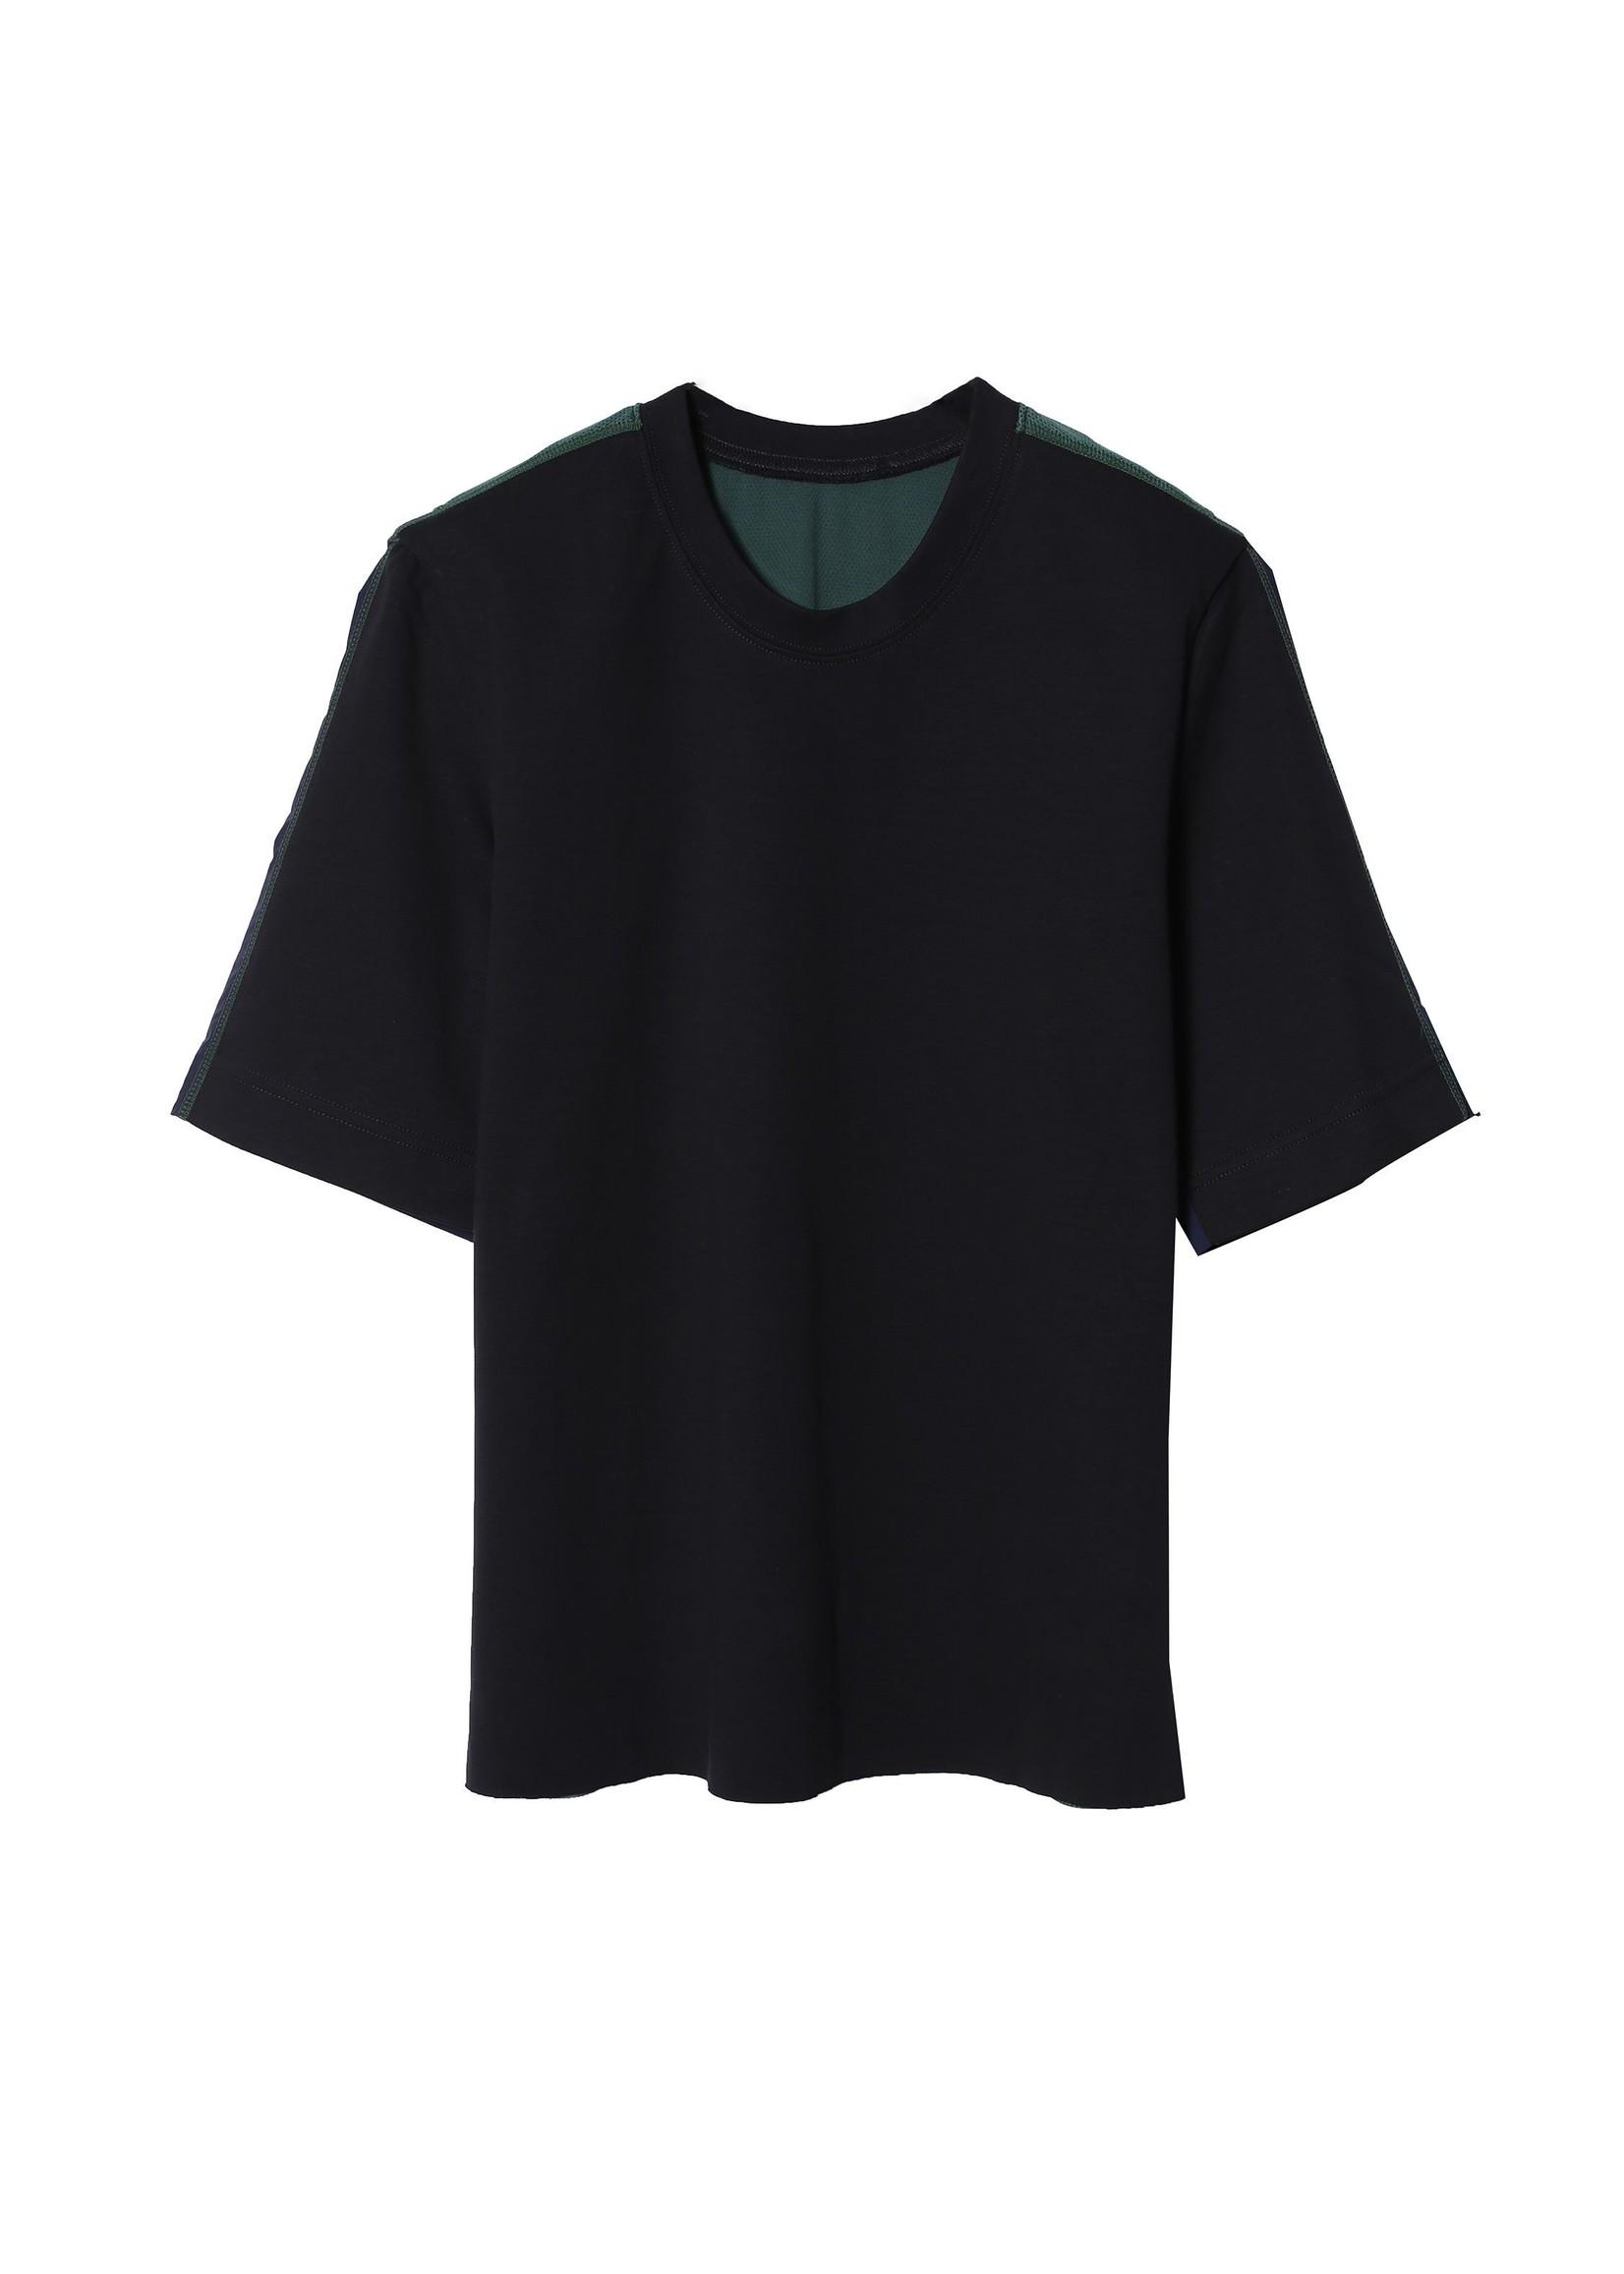 JNBY 5k2610030 shirt